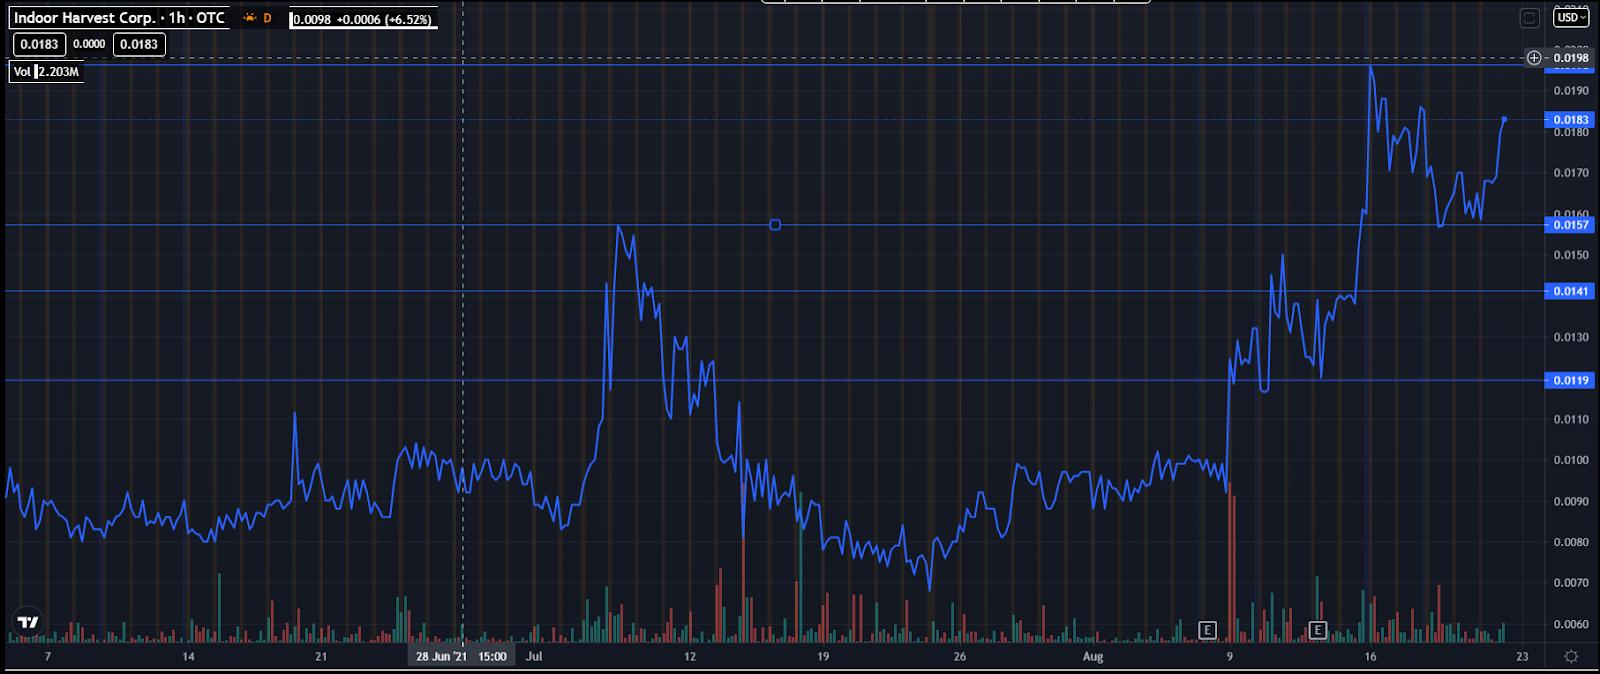 Top Marijuana Penny Stocks 2021 INQD Chart